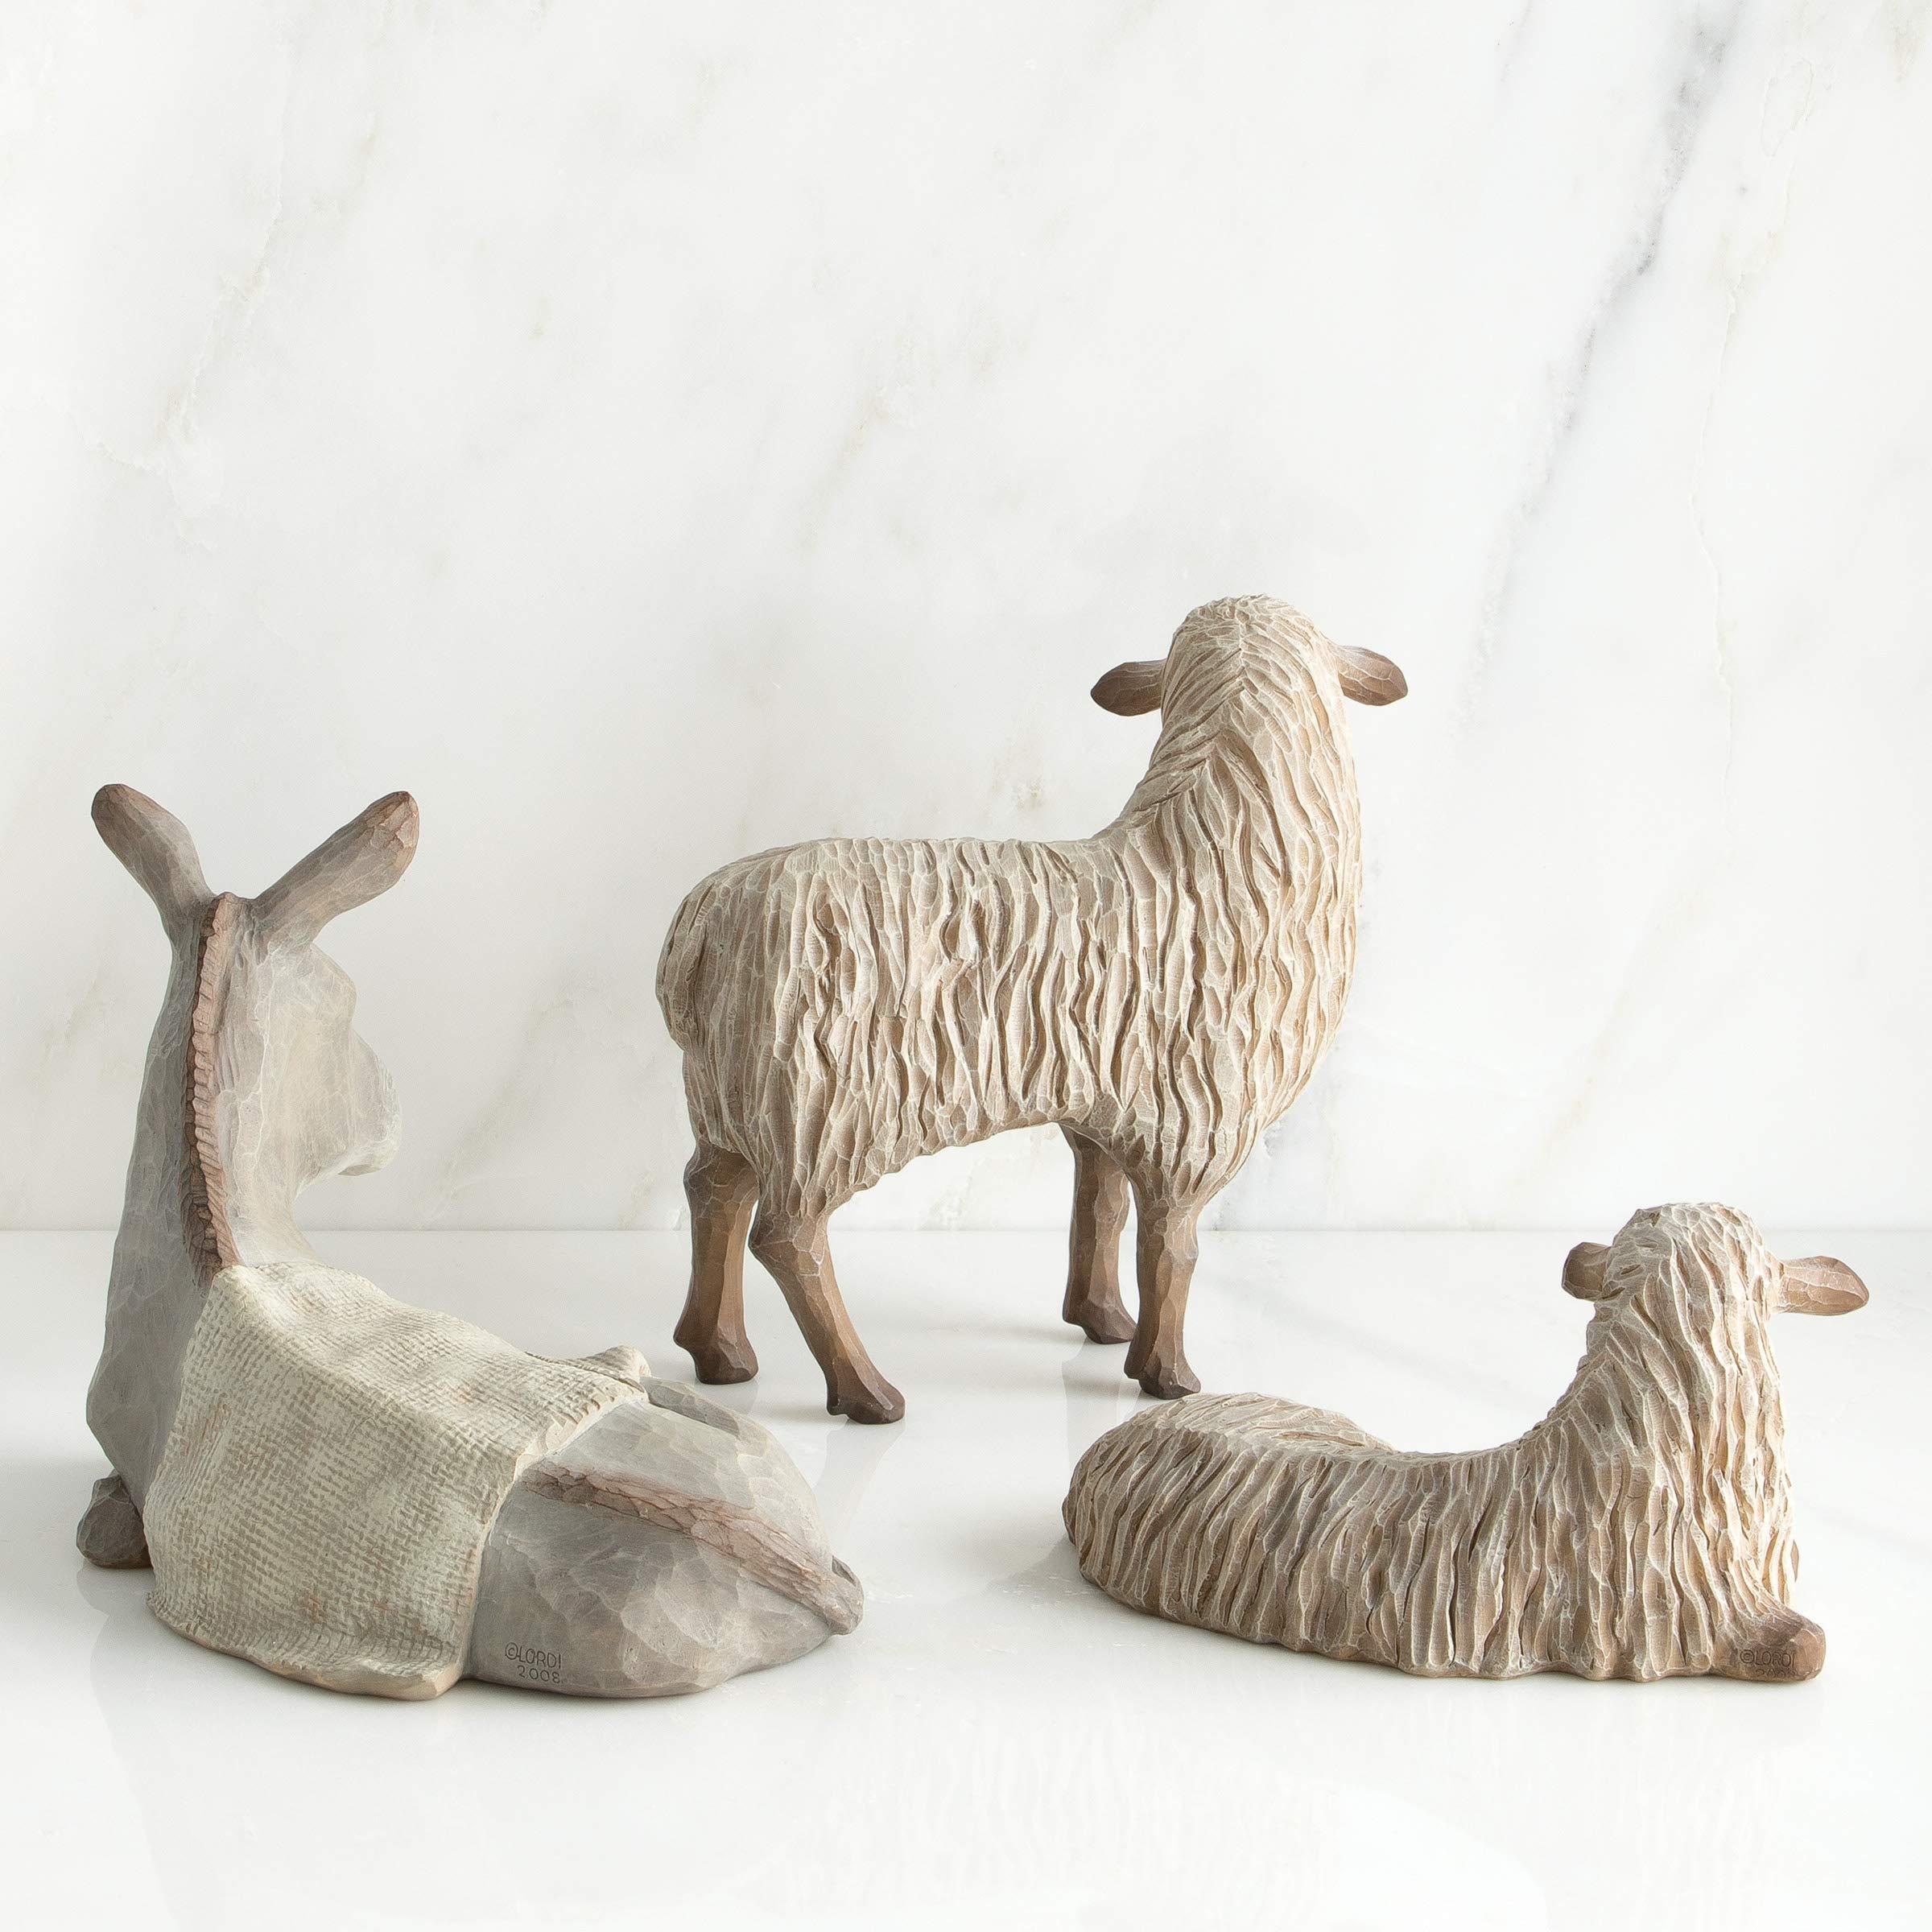 Demdaco WILLOW TREE NATIVITY 4 Piece Shepherd /& Animals 7137143